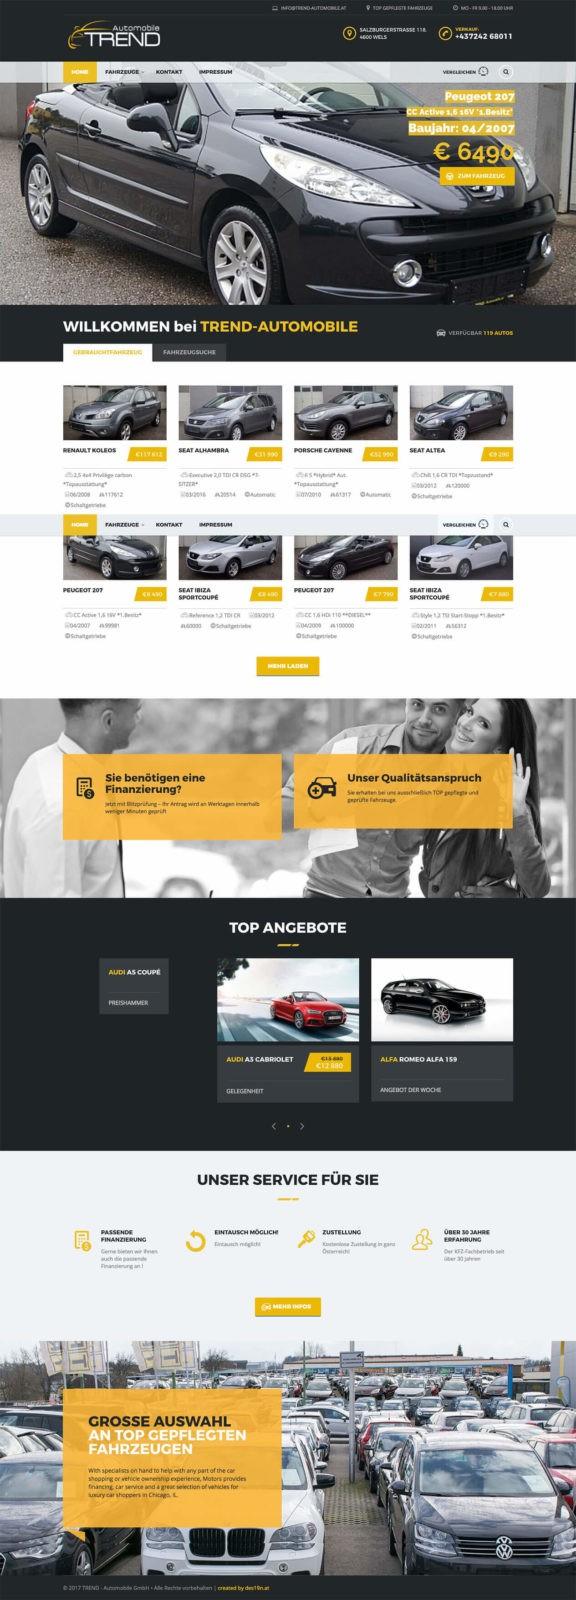 Trendautomobile.at Wels Webseite gesamt